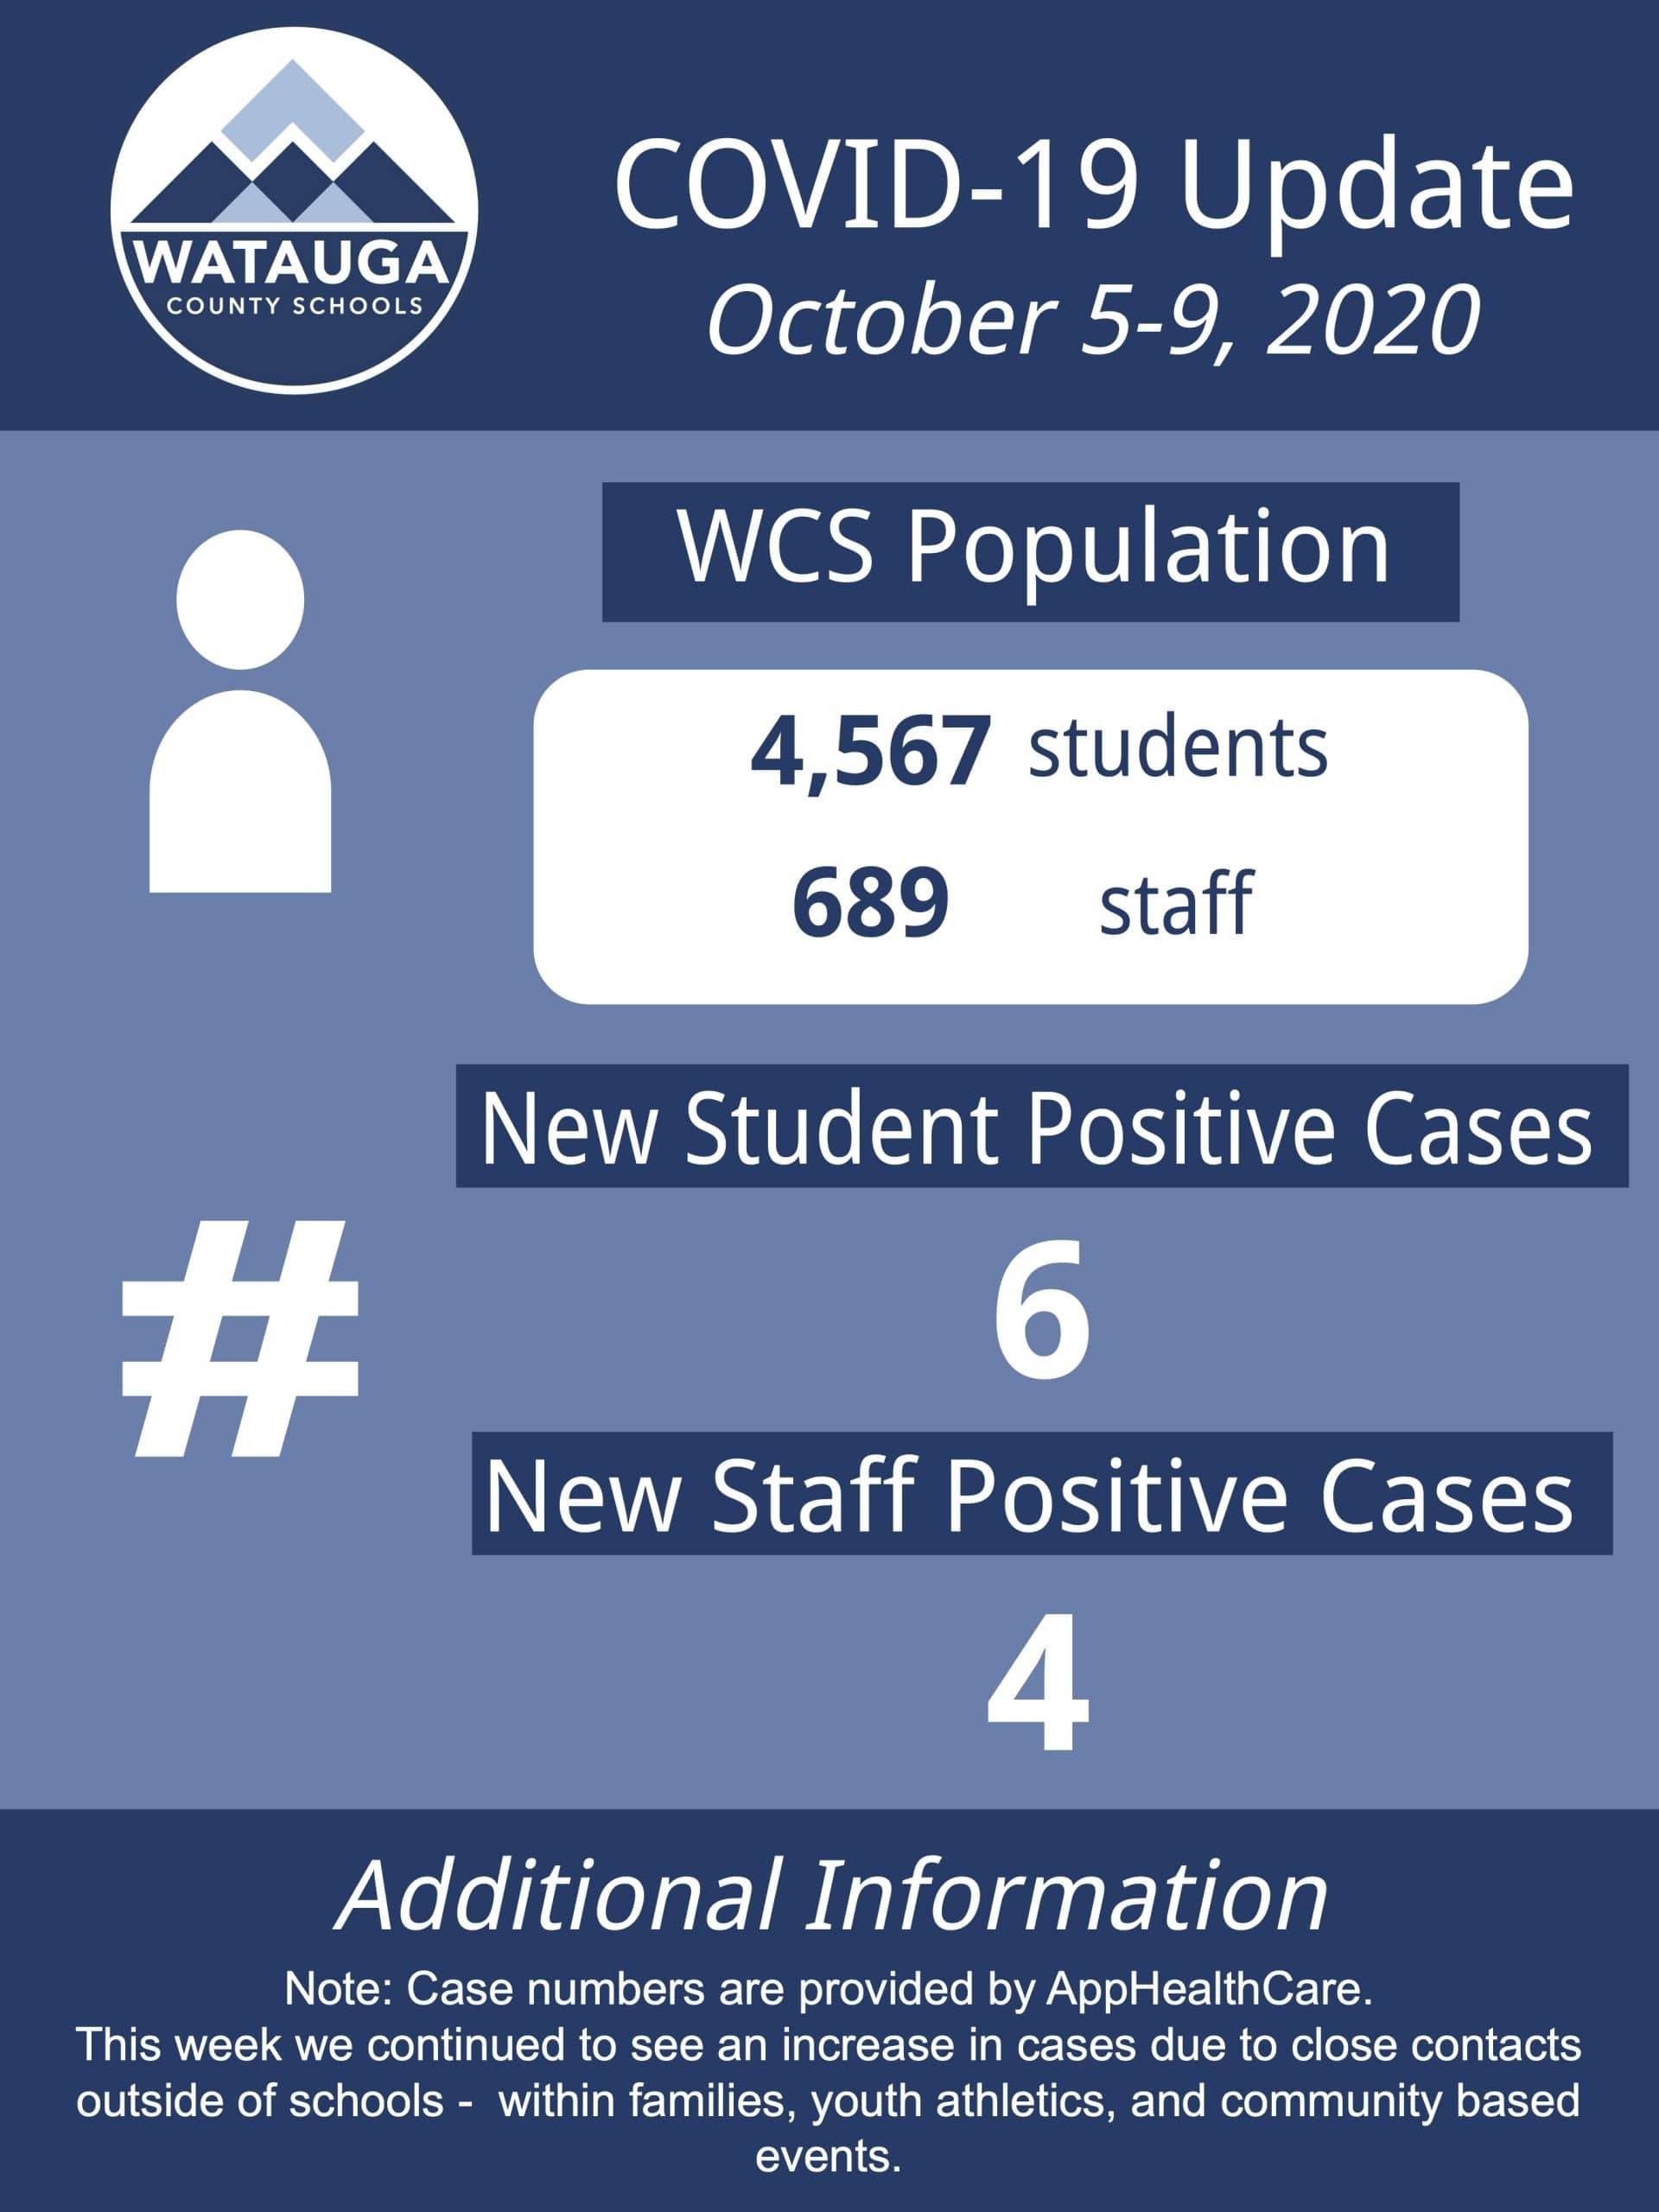 Watauga Schools begin week two of K-3 in-person learning, COVID-19 update